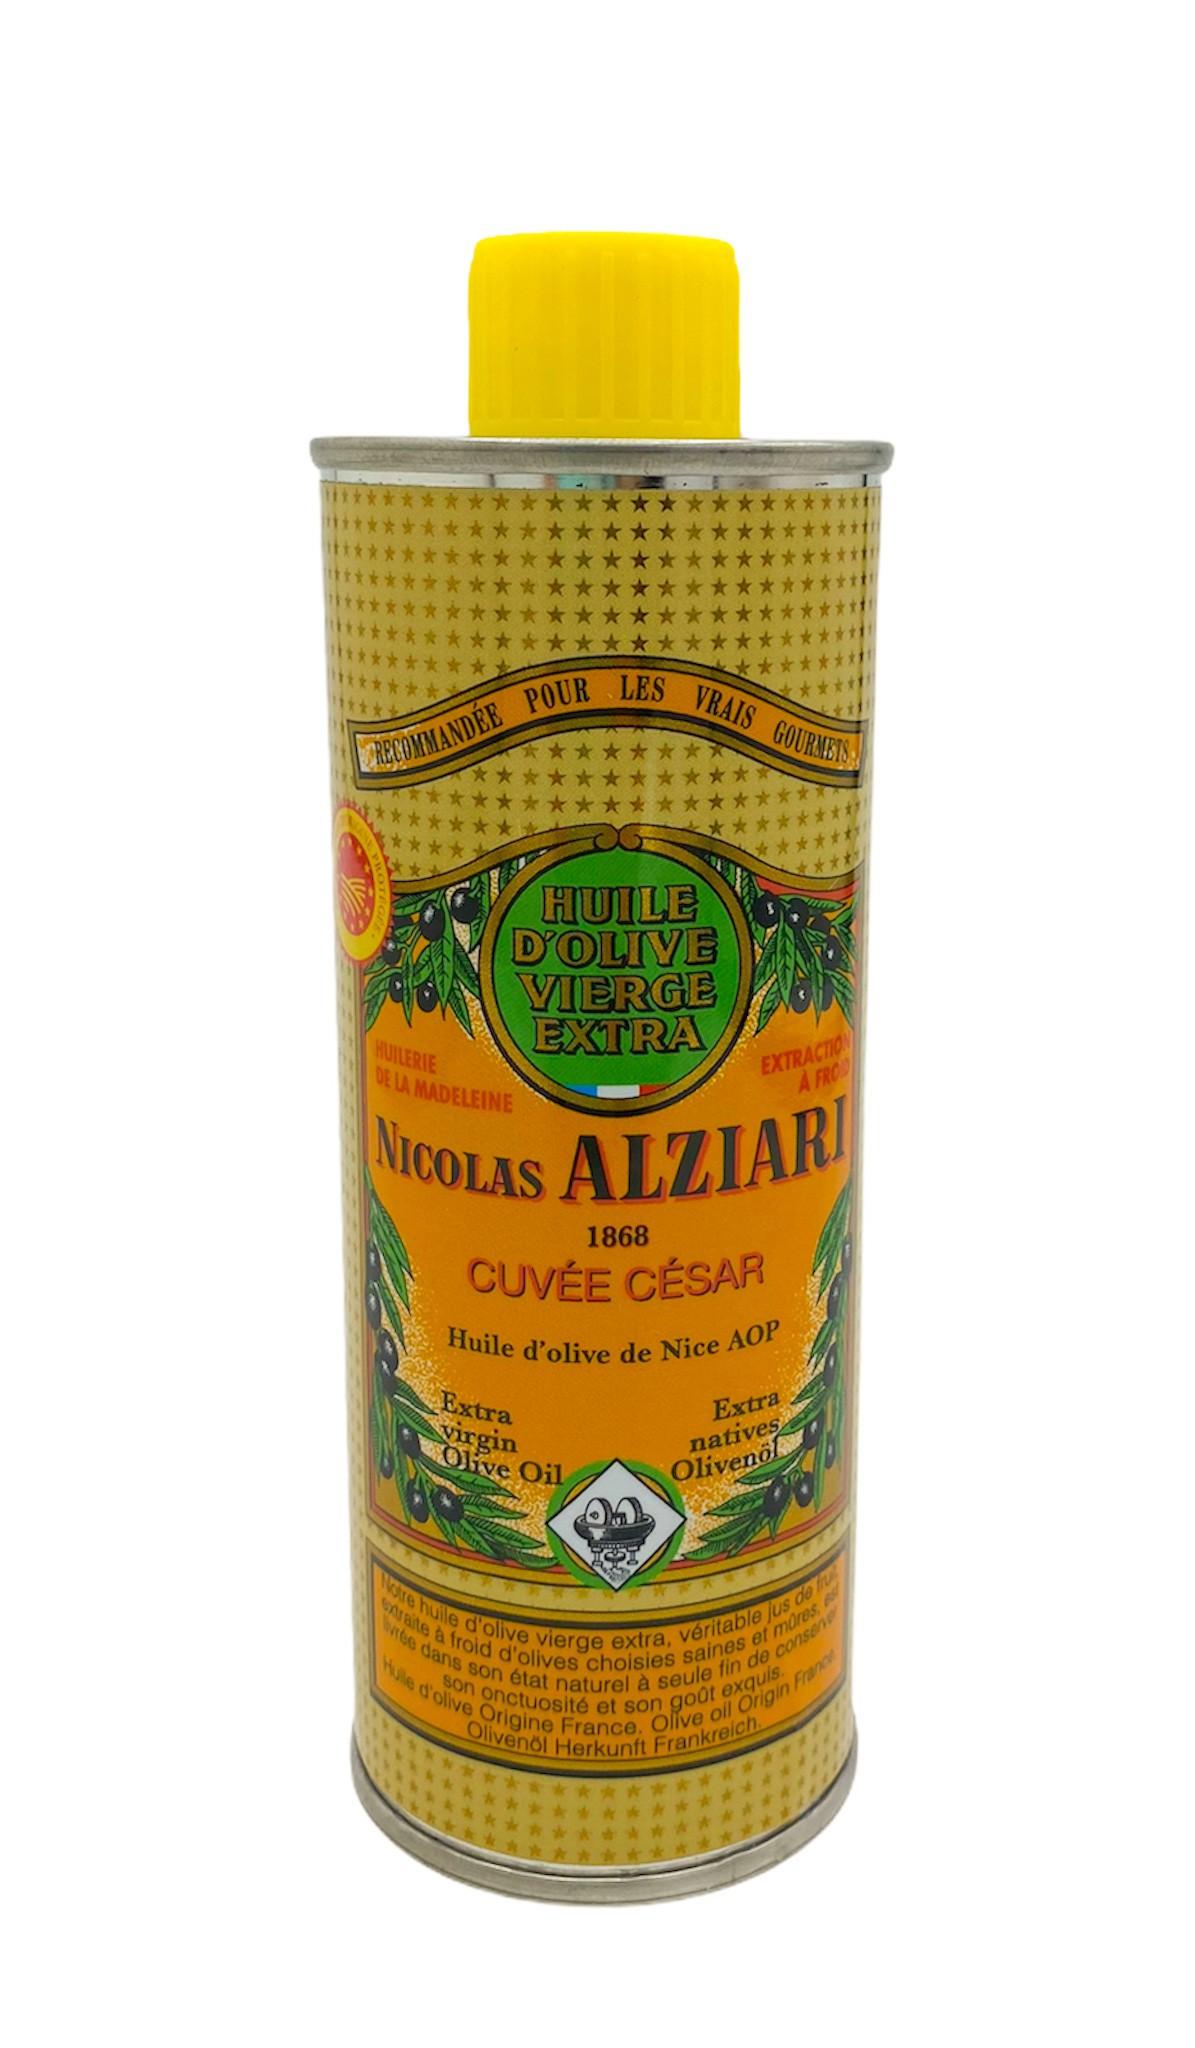 Huile d'olive Nicolas Alziari cuvée César 250 ml (AOP Nice)